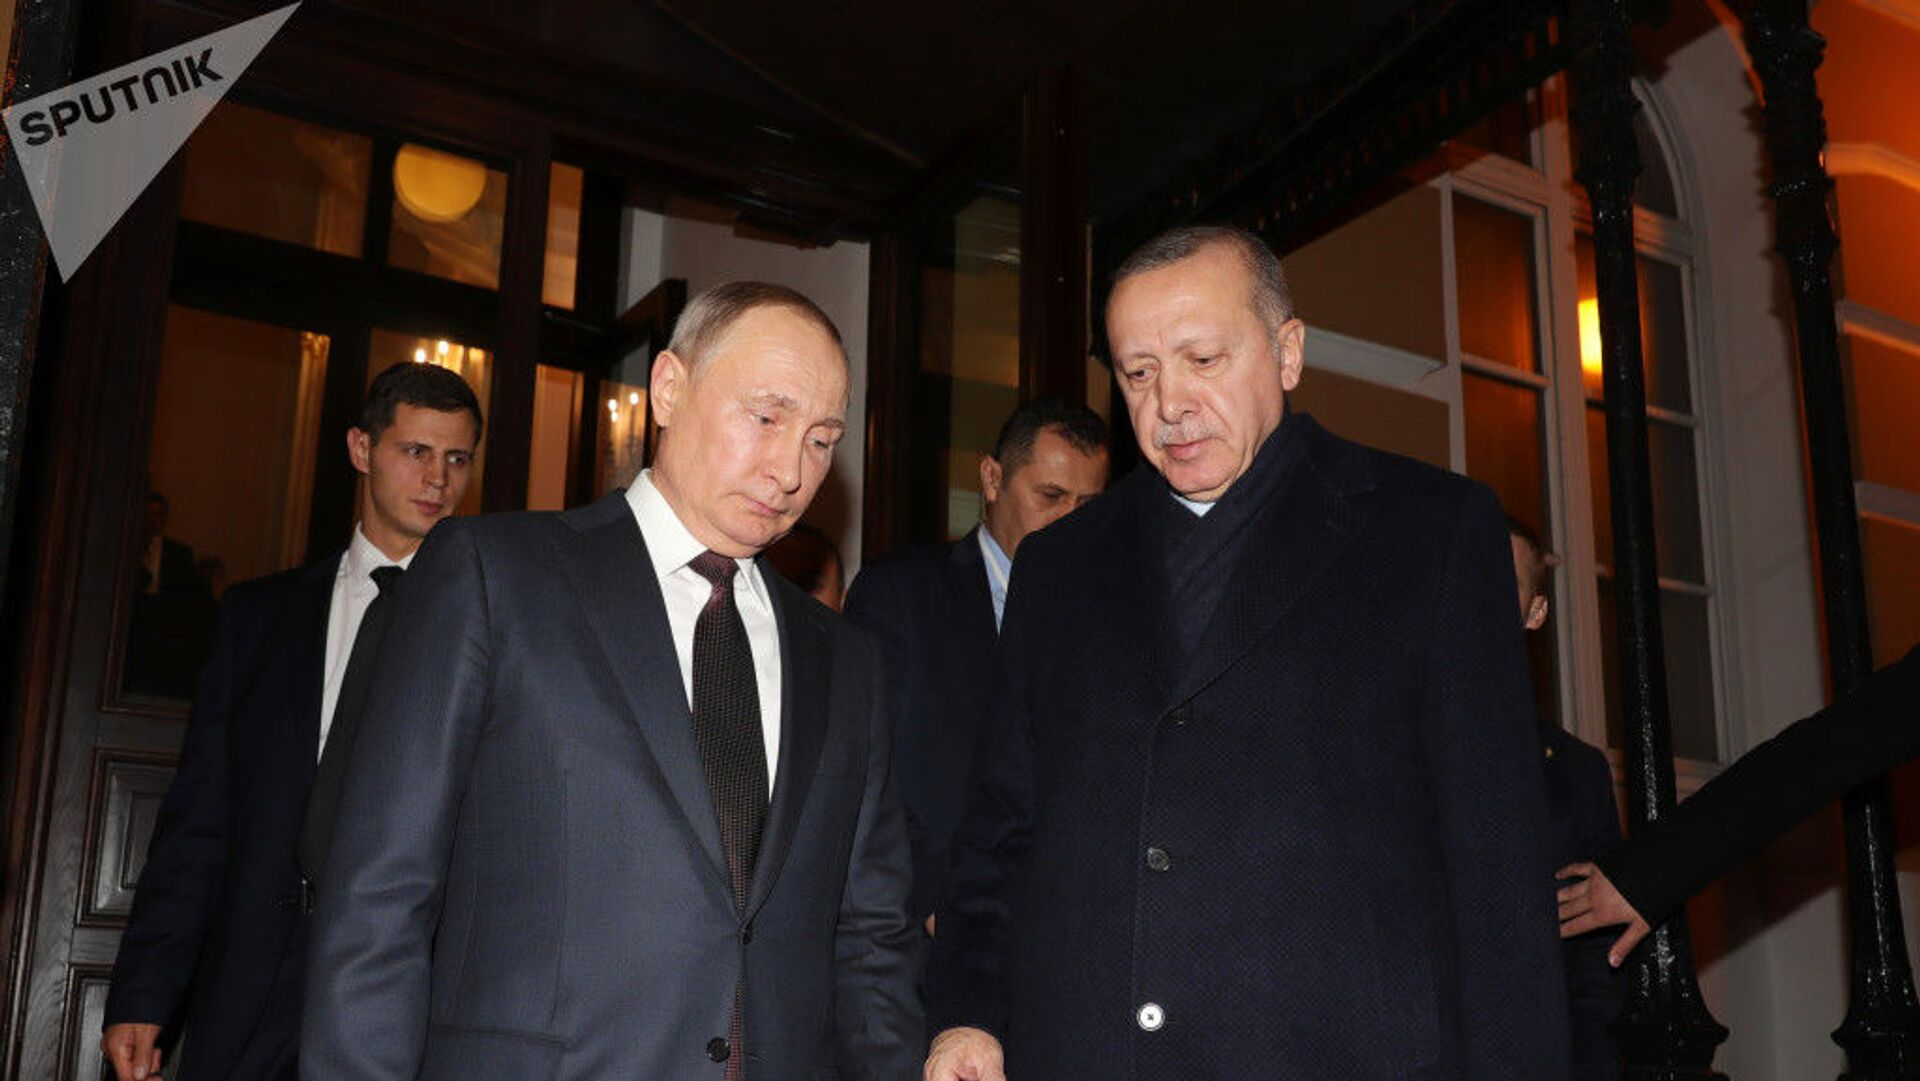 Президент РФ Владимир Путин и президент Турции Реджеп Тайип Эрдоган - Sputnik Азербайджан, 1920, 28.09.2021